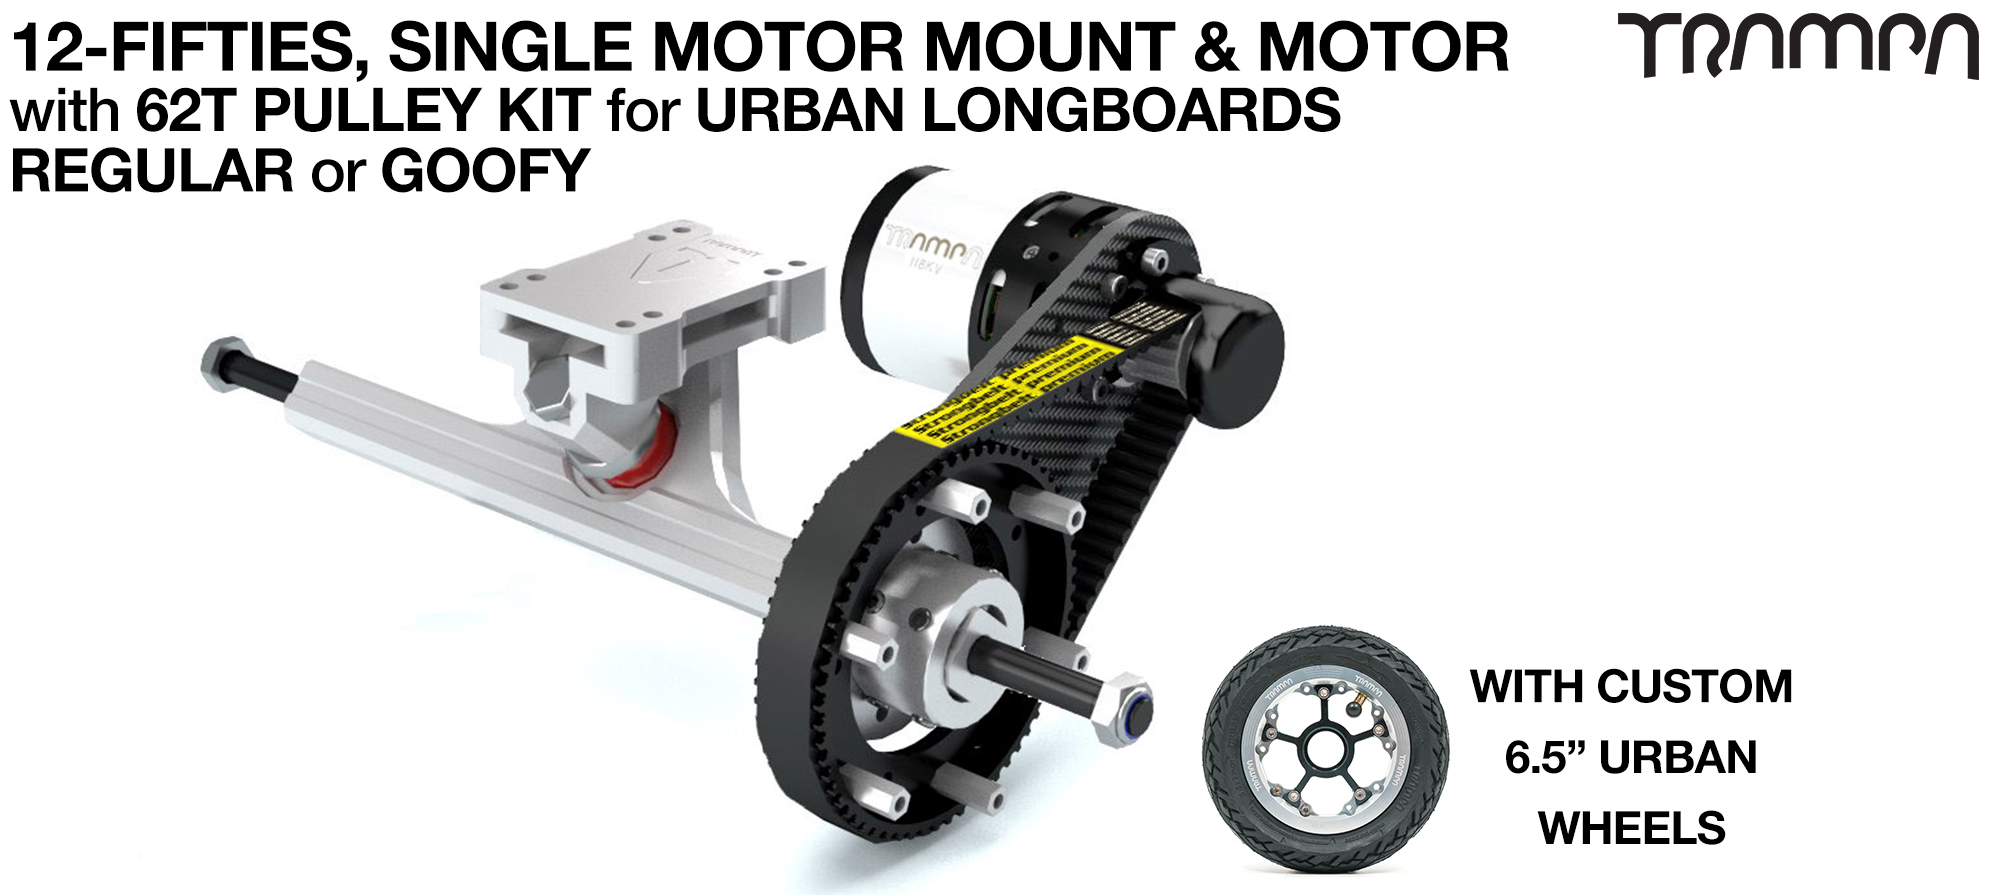 Original 12FiFties Motor Mount with 62 Tooth URBAN  Pulley Kit & Motor & 2x 12FiFties Trucks & 4x URBAN Wheels - SINGLE